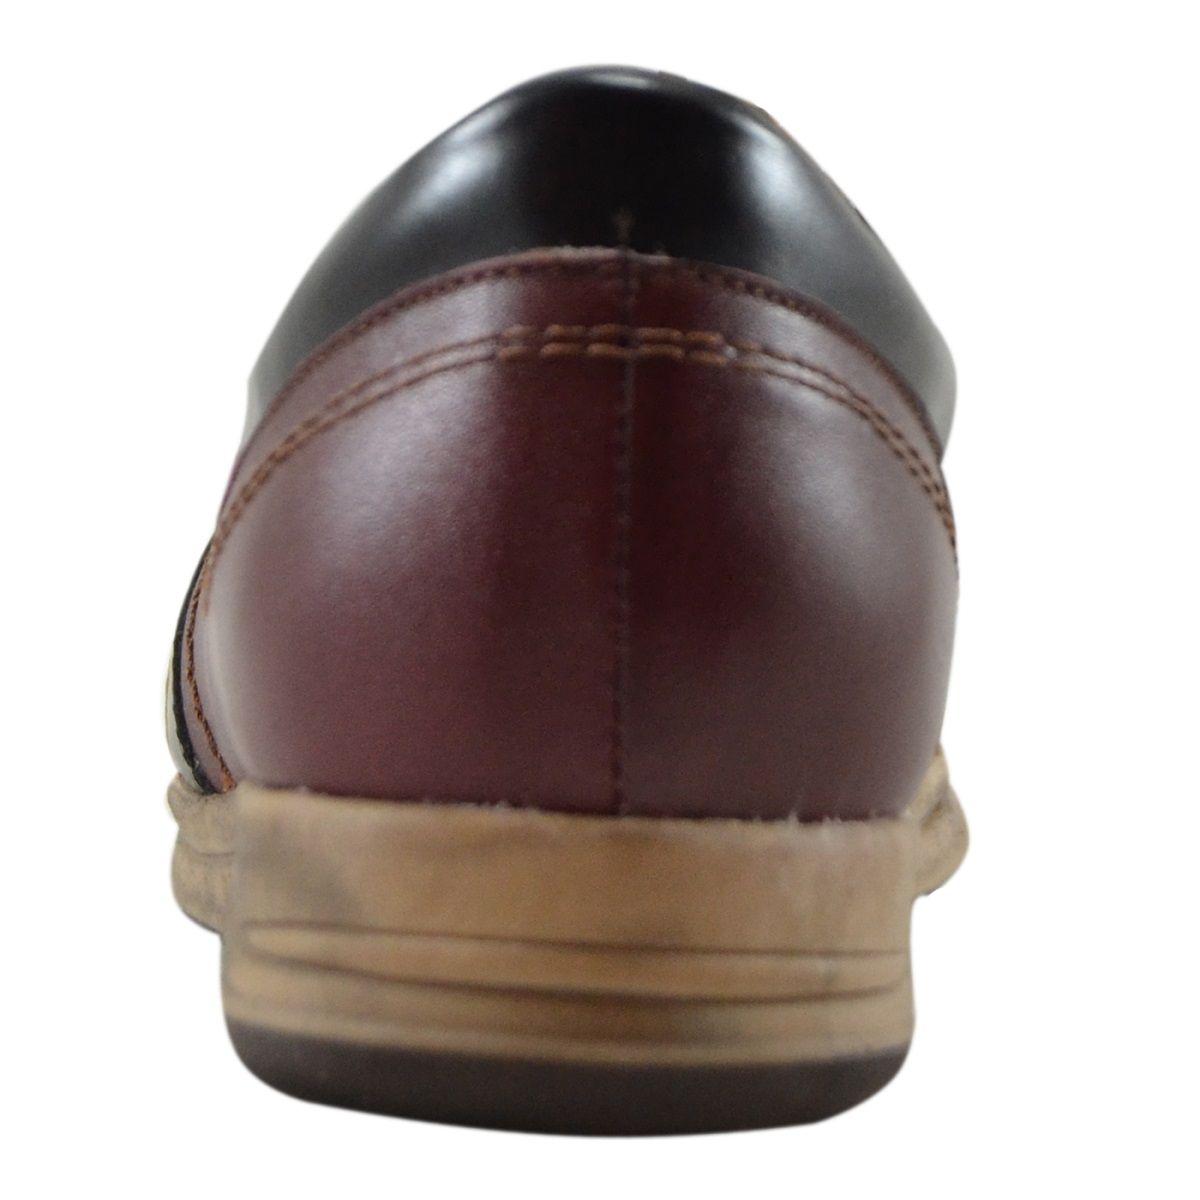 کفش روزمره زنانه کد 554 -  - 4